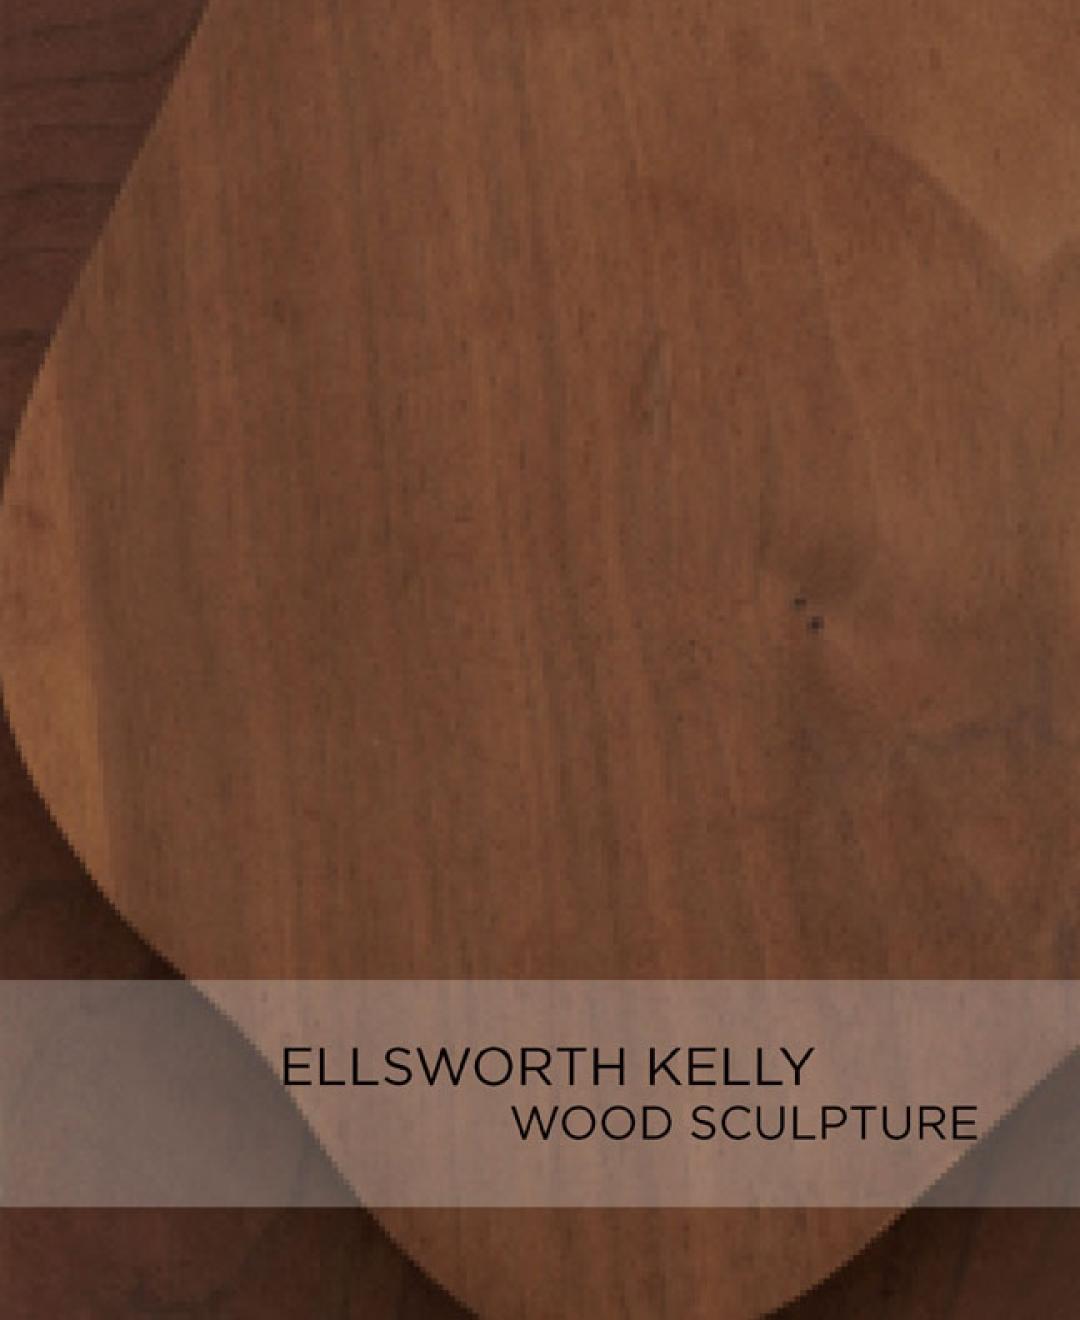 Ellsworth Kelly Wood Sculpture